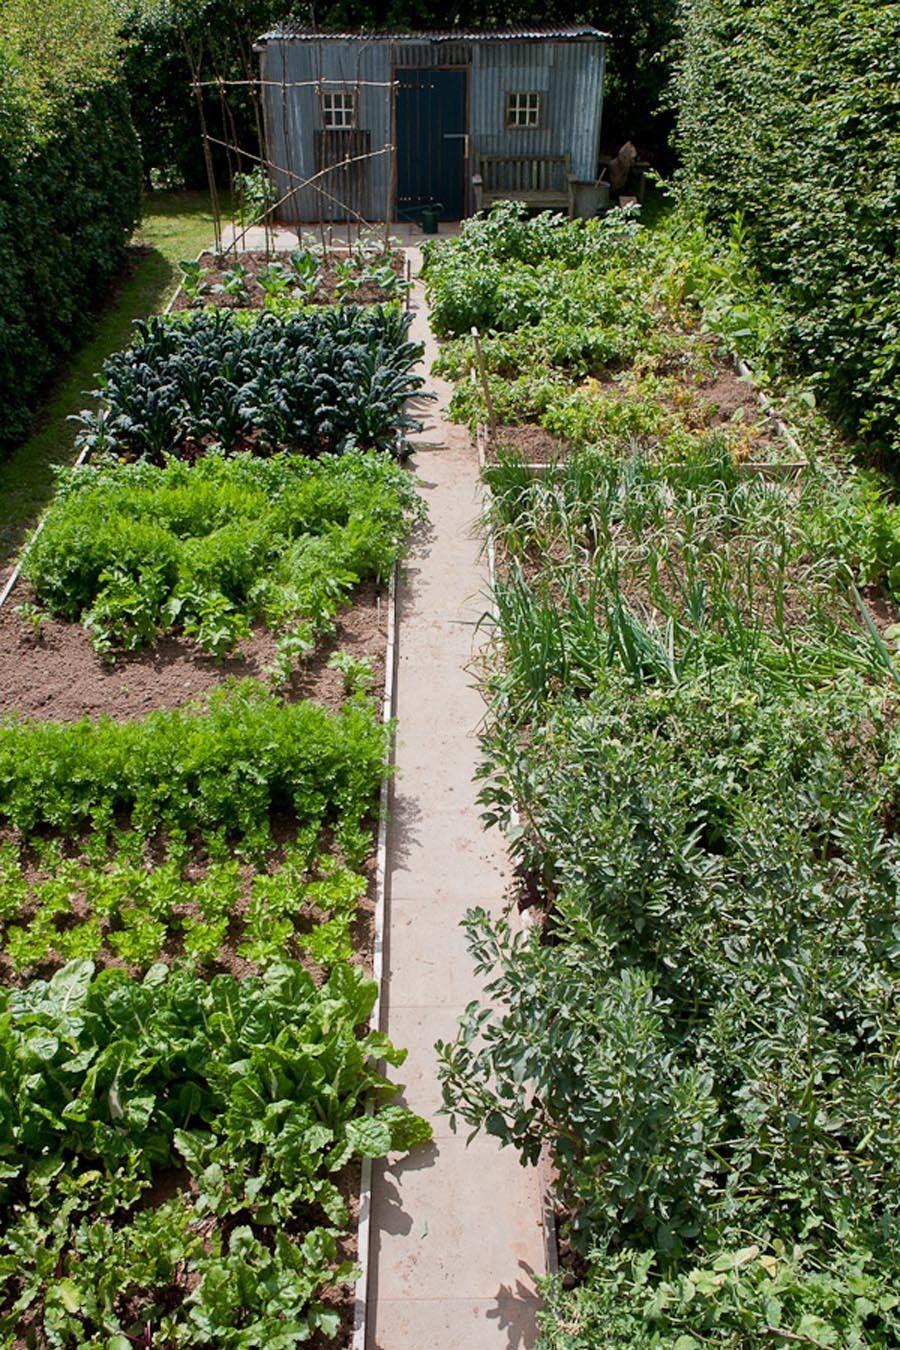 Landscape Focused Landscape Garden Design Ideas Monty Don In His Garden At Longmeadow Images By Gardeningdesi Potager Garden Backyard Vegetable Garden